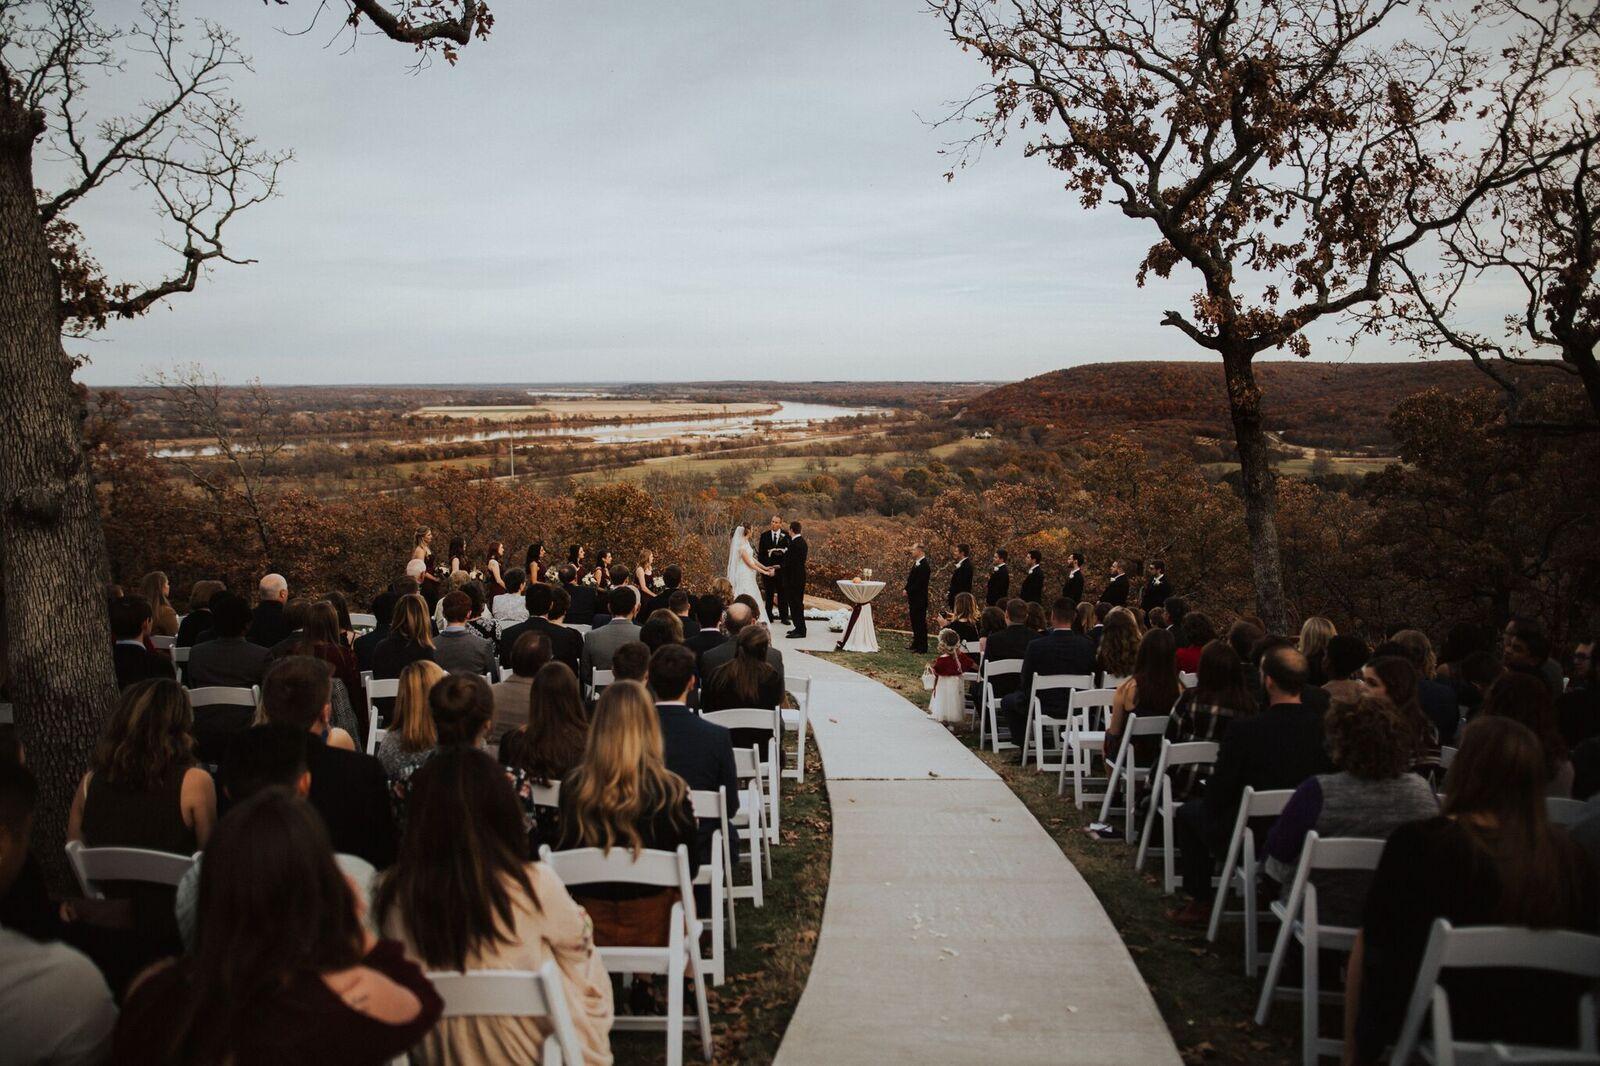 Tulsa Wedding Venue White Barn 17c.jpg